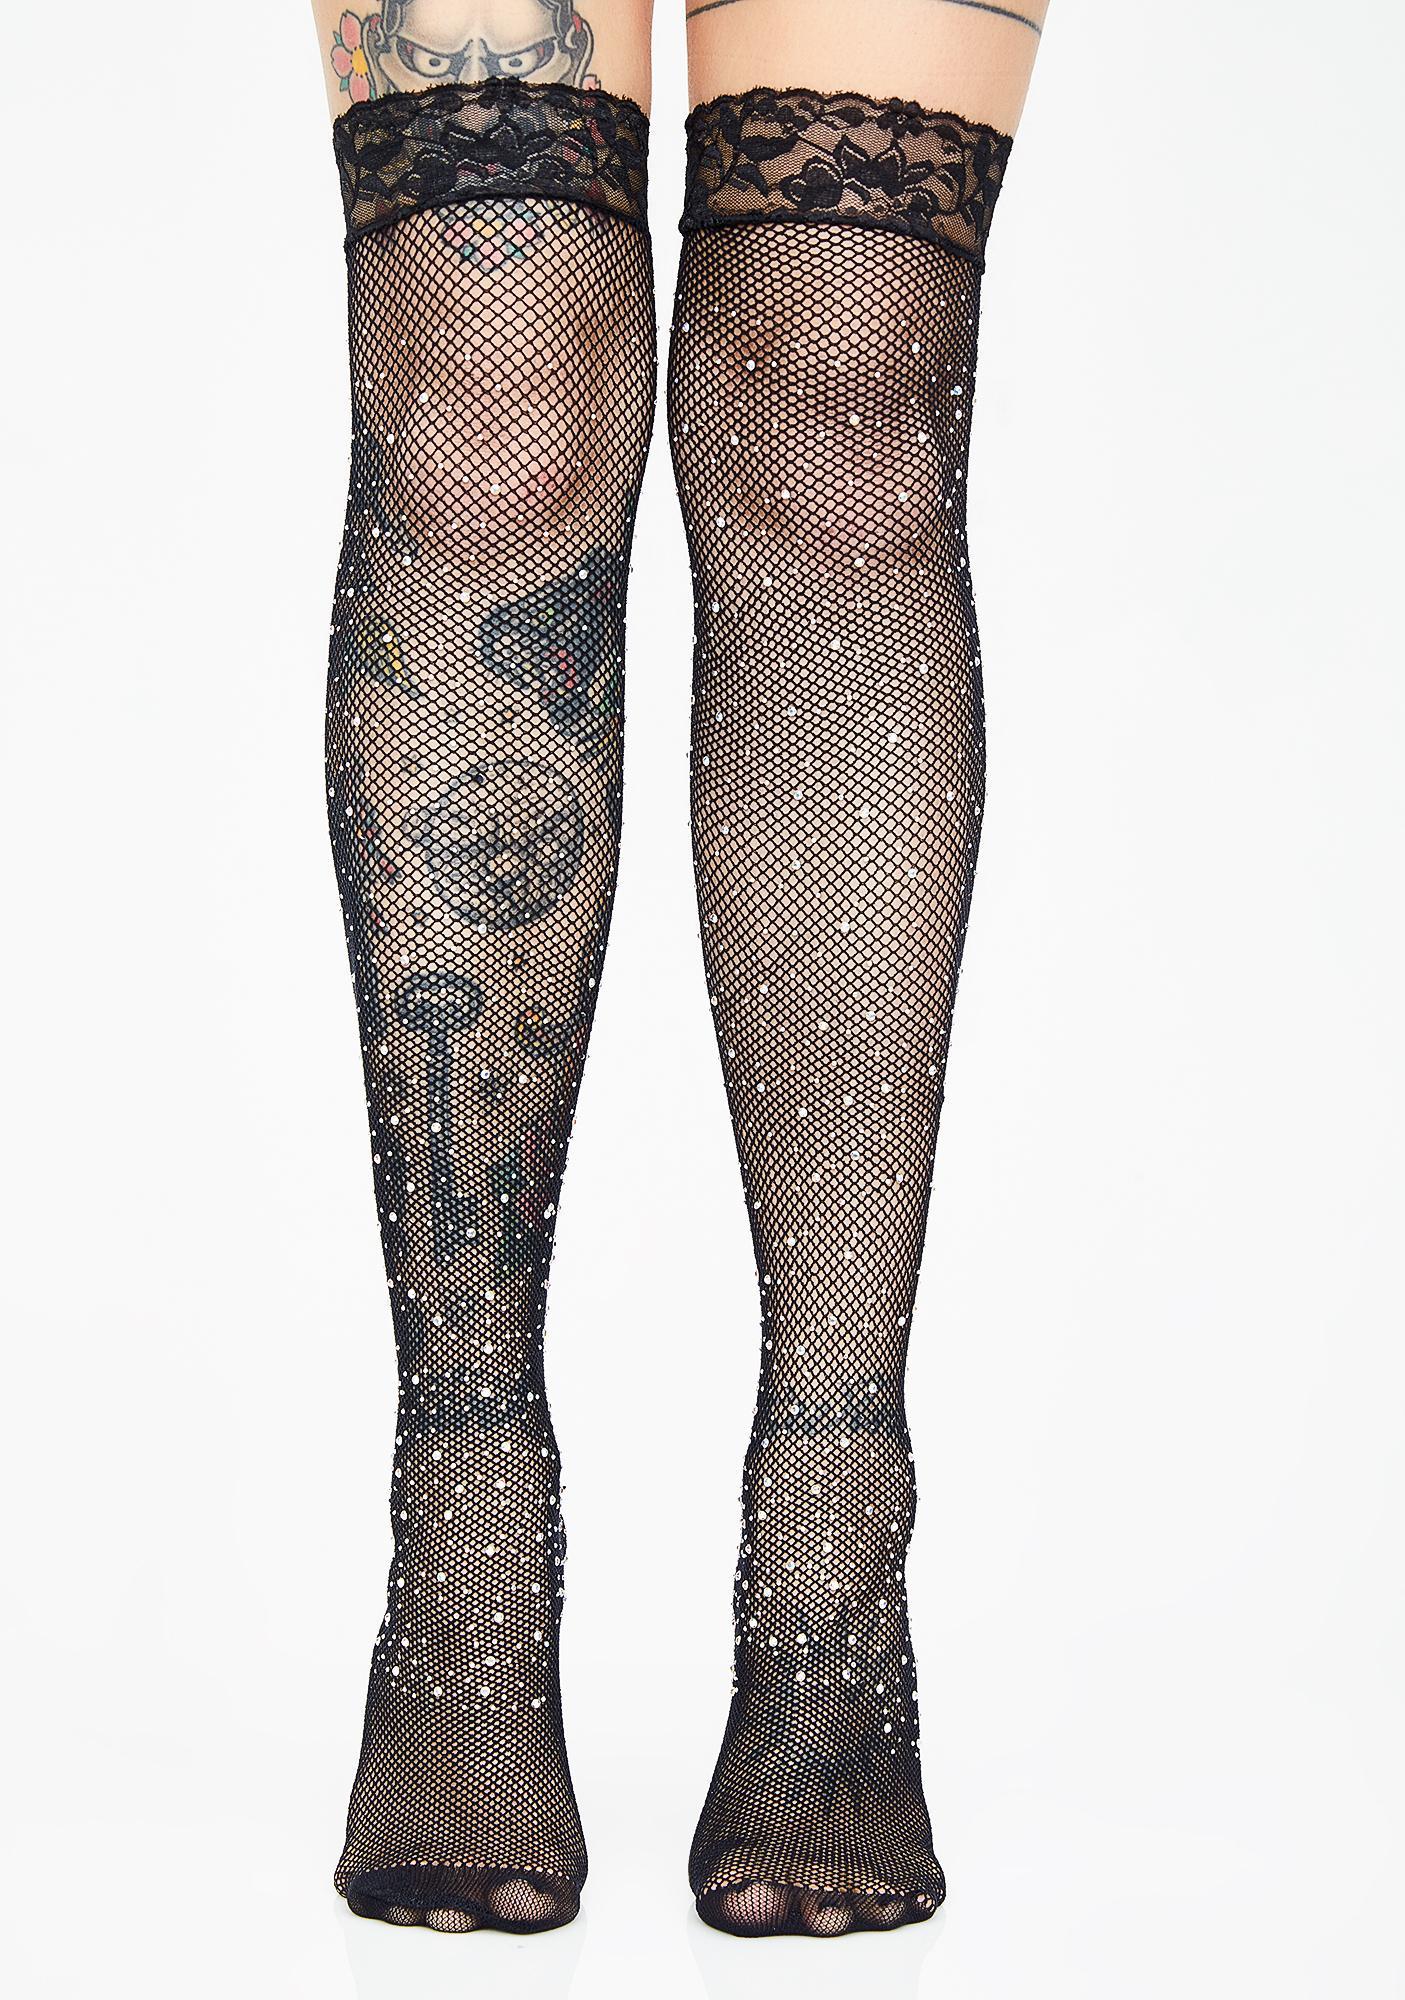 8e981395e Rhinestone Thigh High Fishnet Stockings